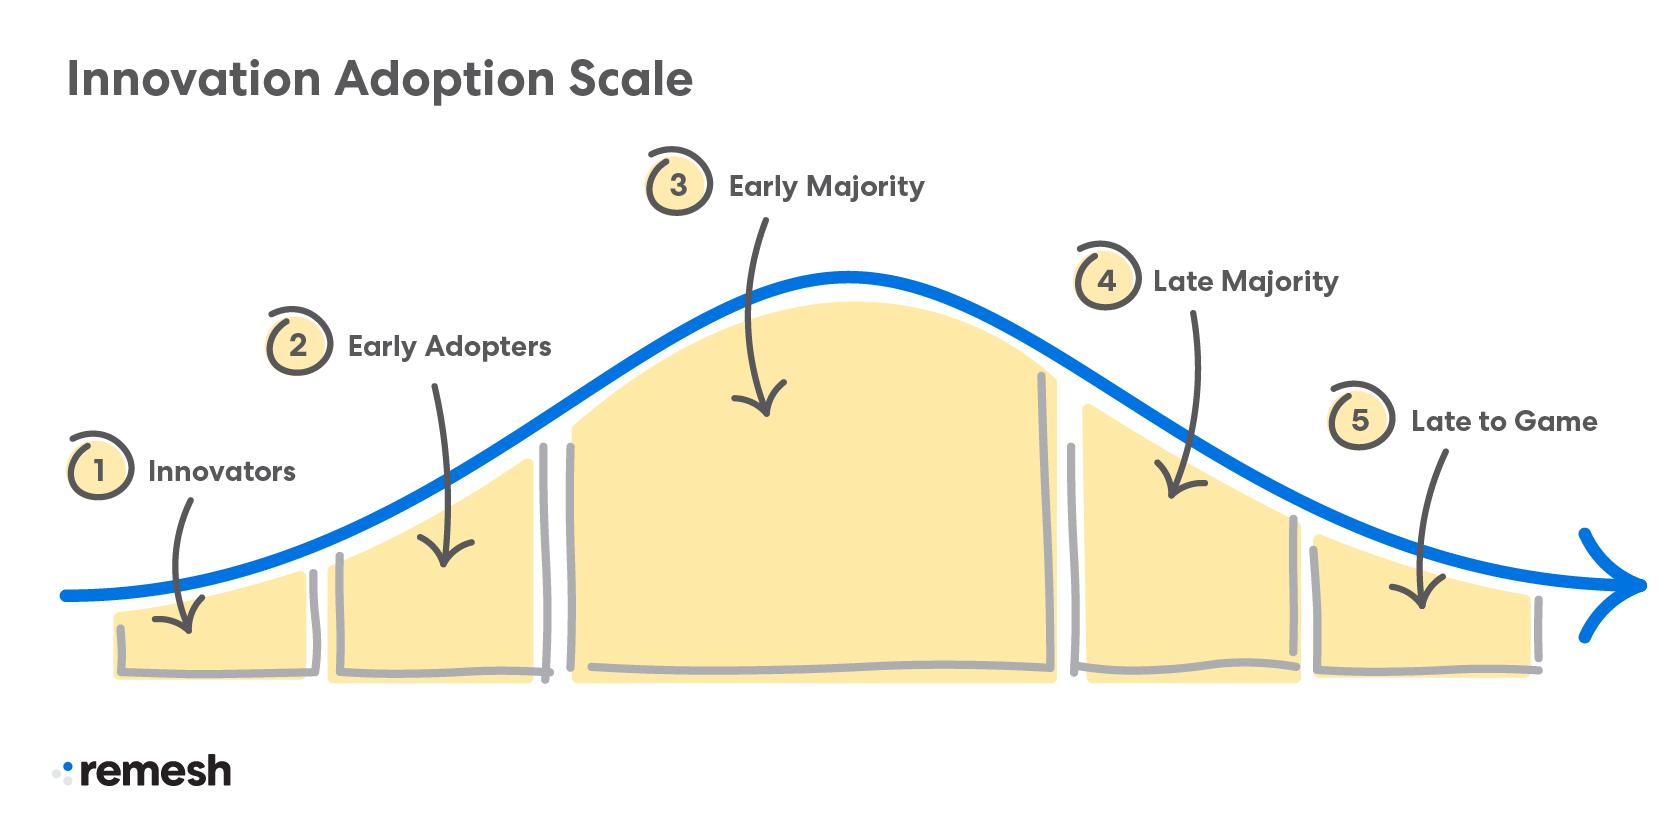 Innovation Adoption Scale